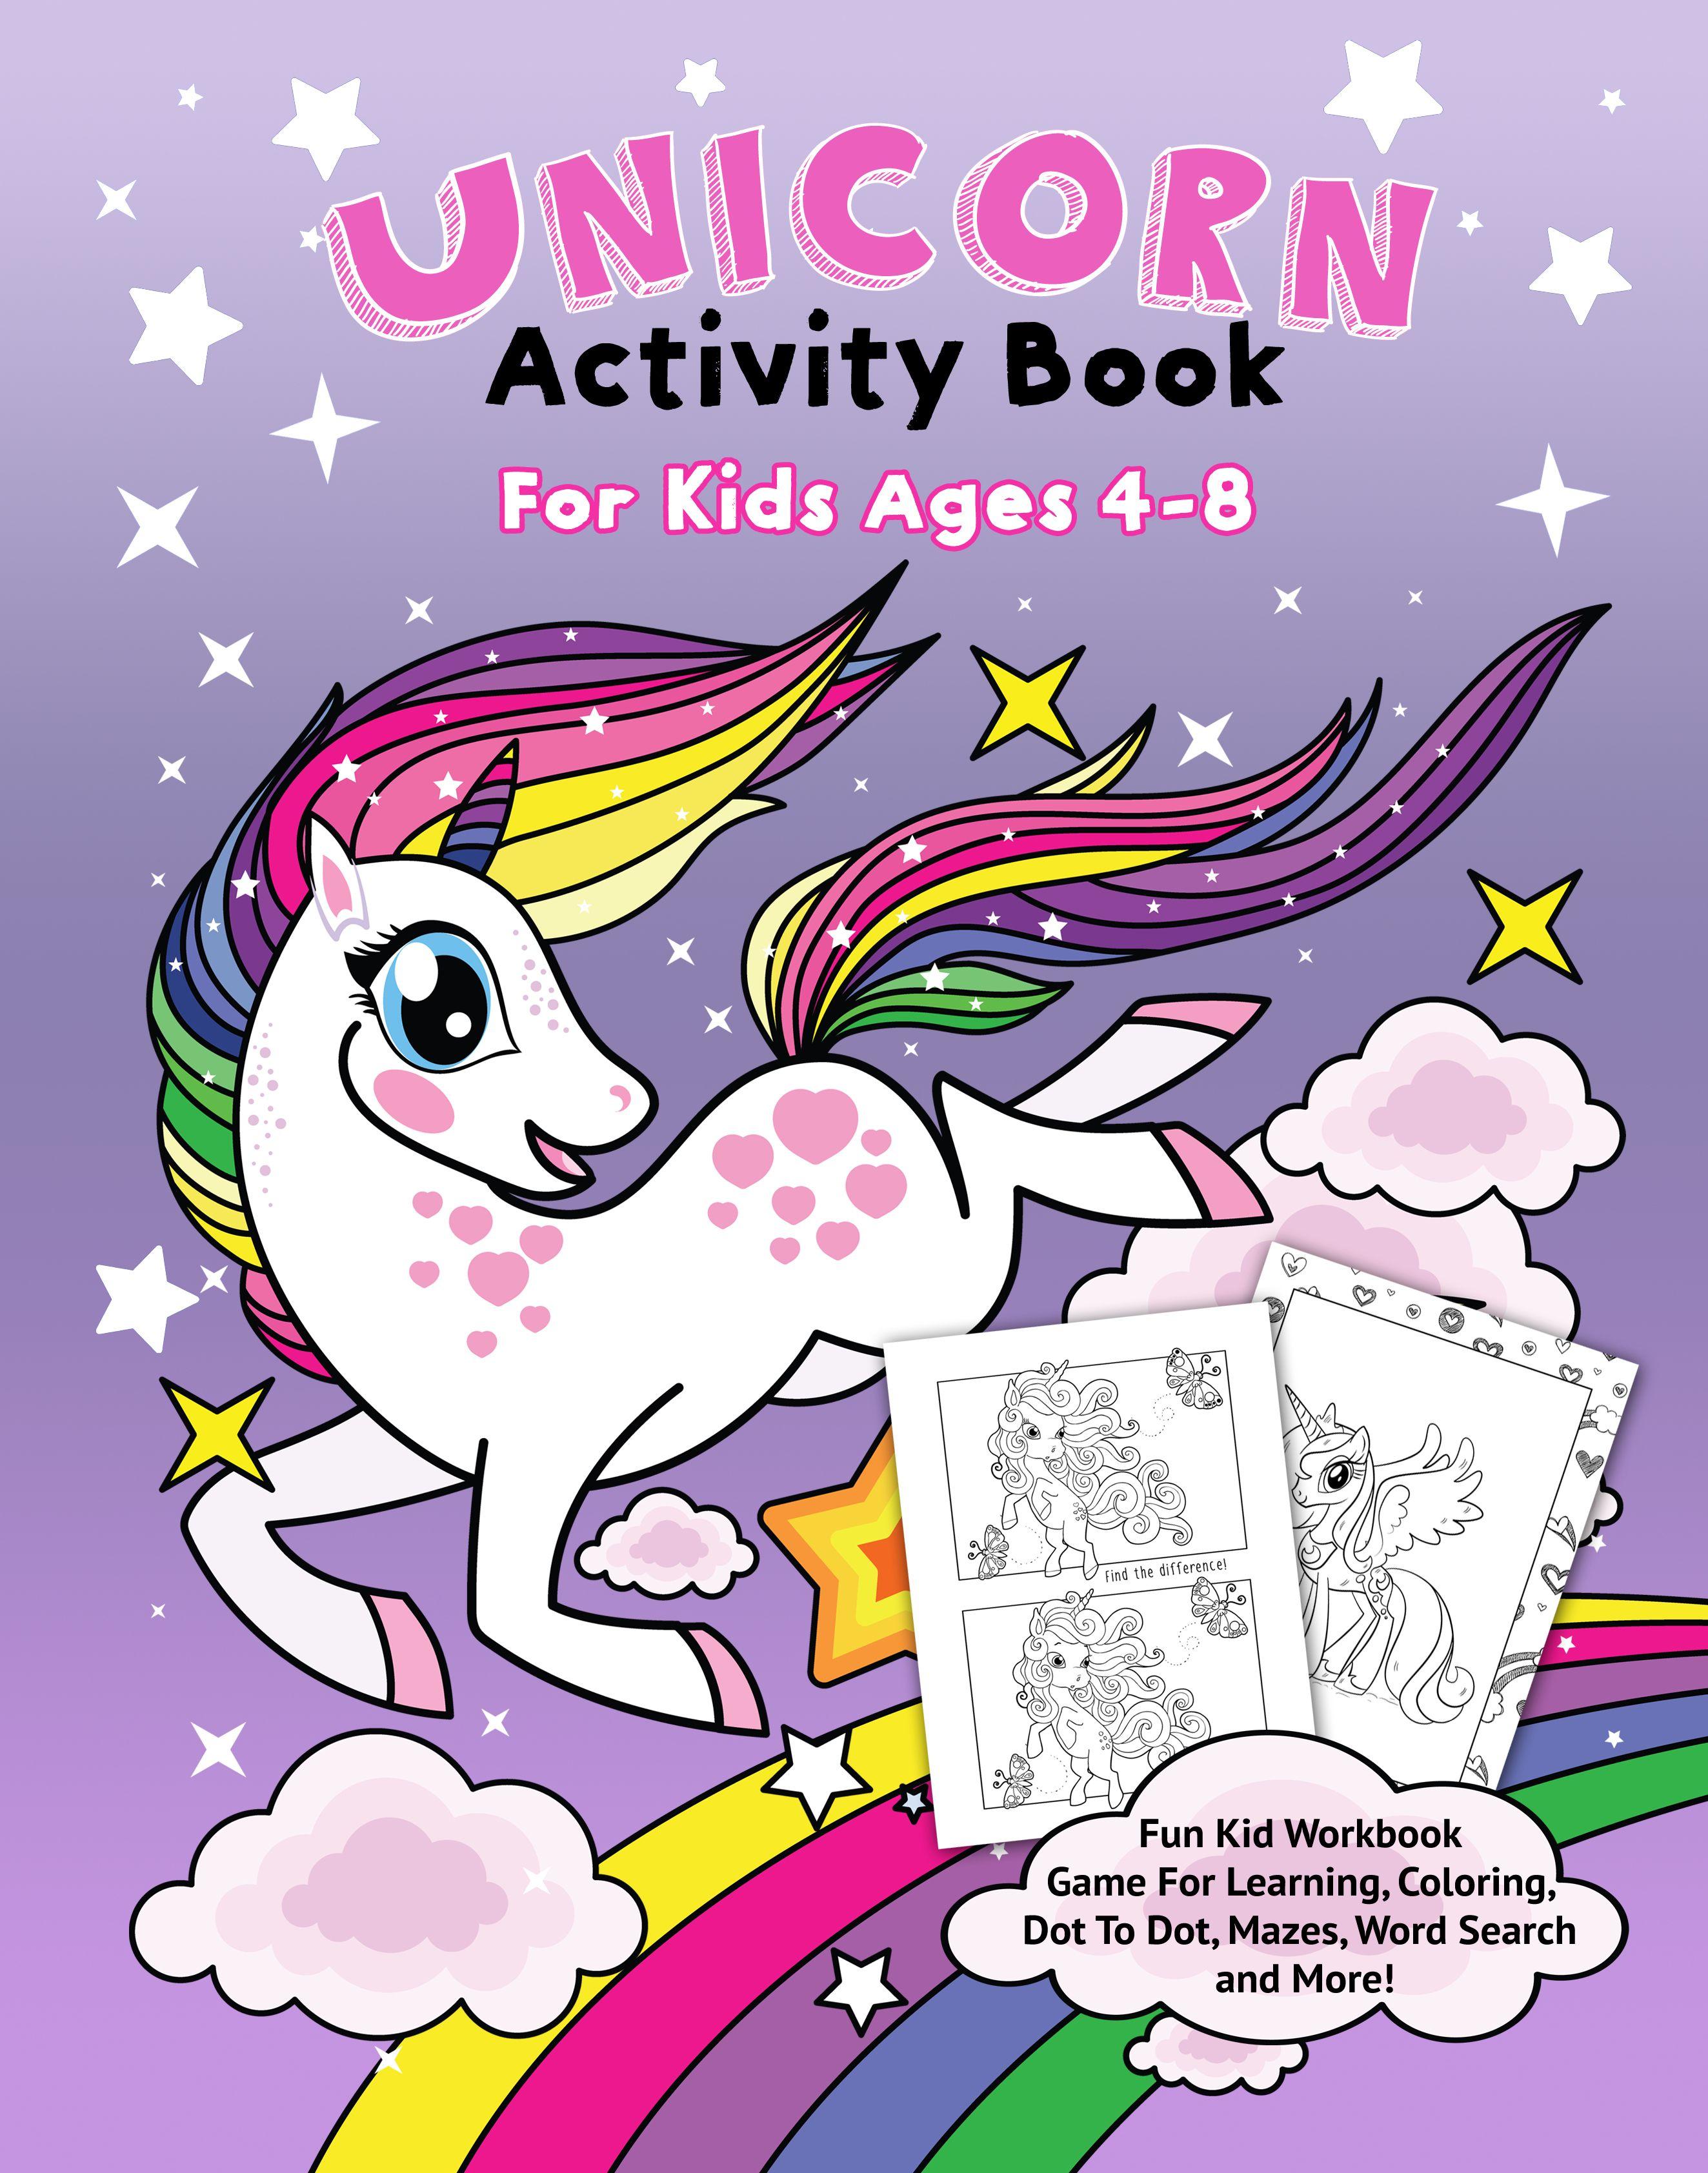 Unicorn Activity Book For Kids 4 8 Book Activities Unicorn Free Books Online